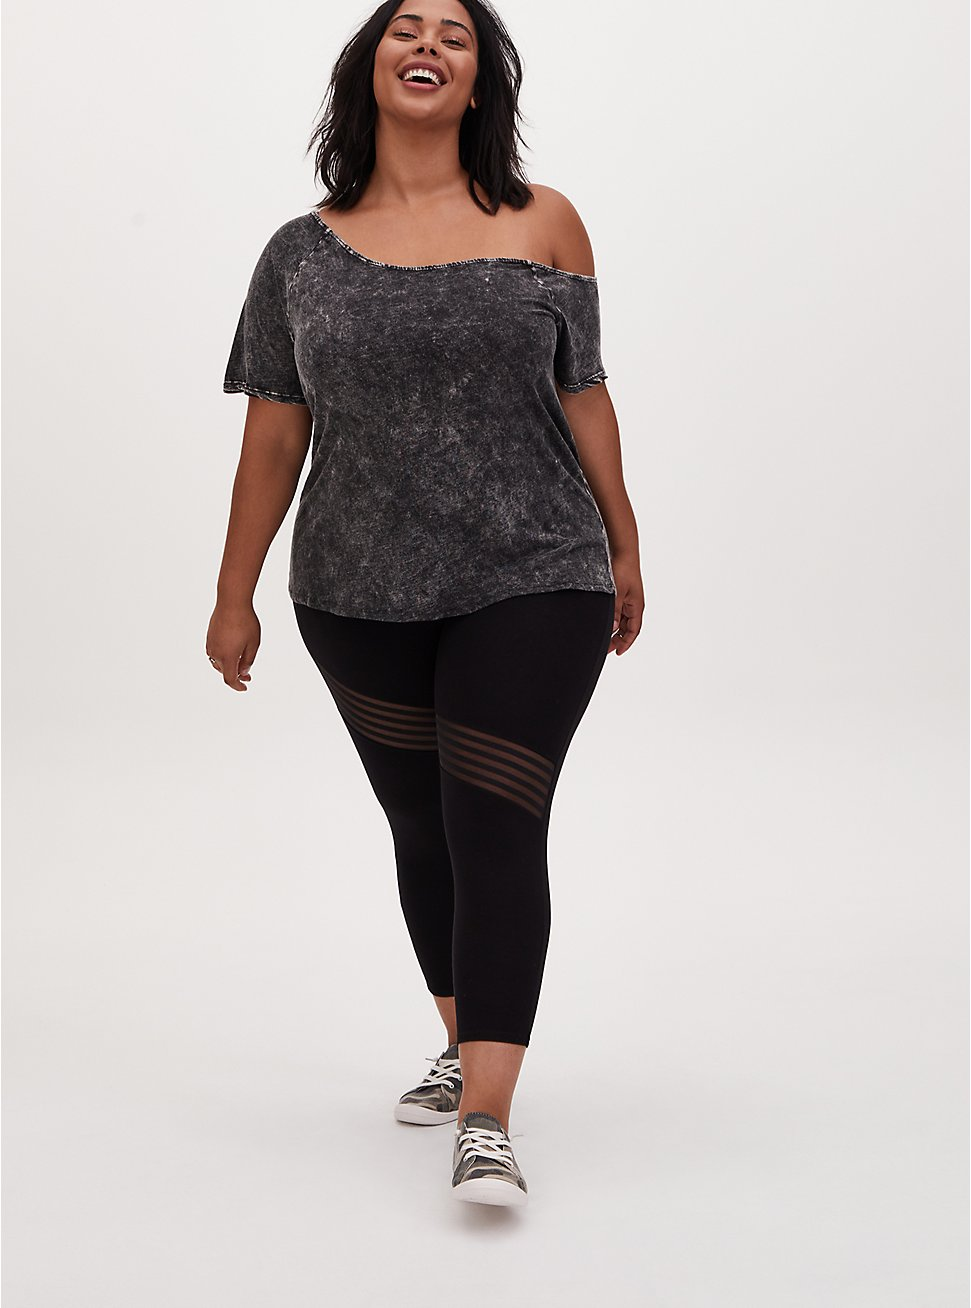 Plus Size Crop Premium Legging - Asymmetrical Shadow Stripe Black , BLACK, hi-res